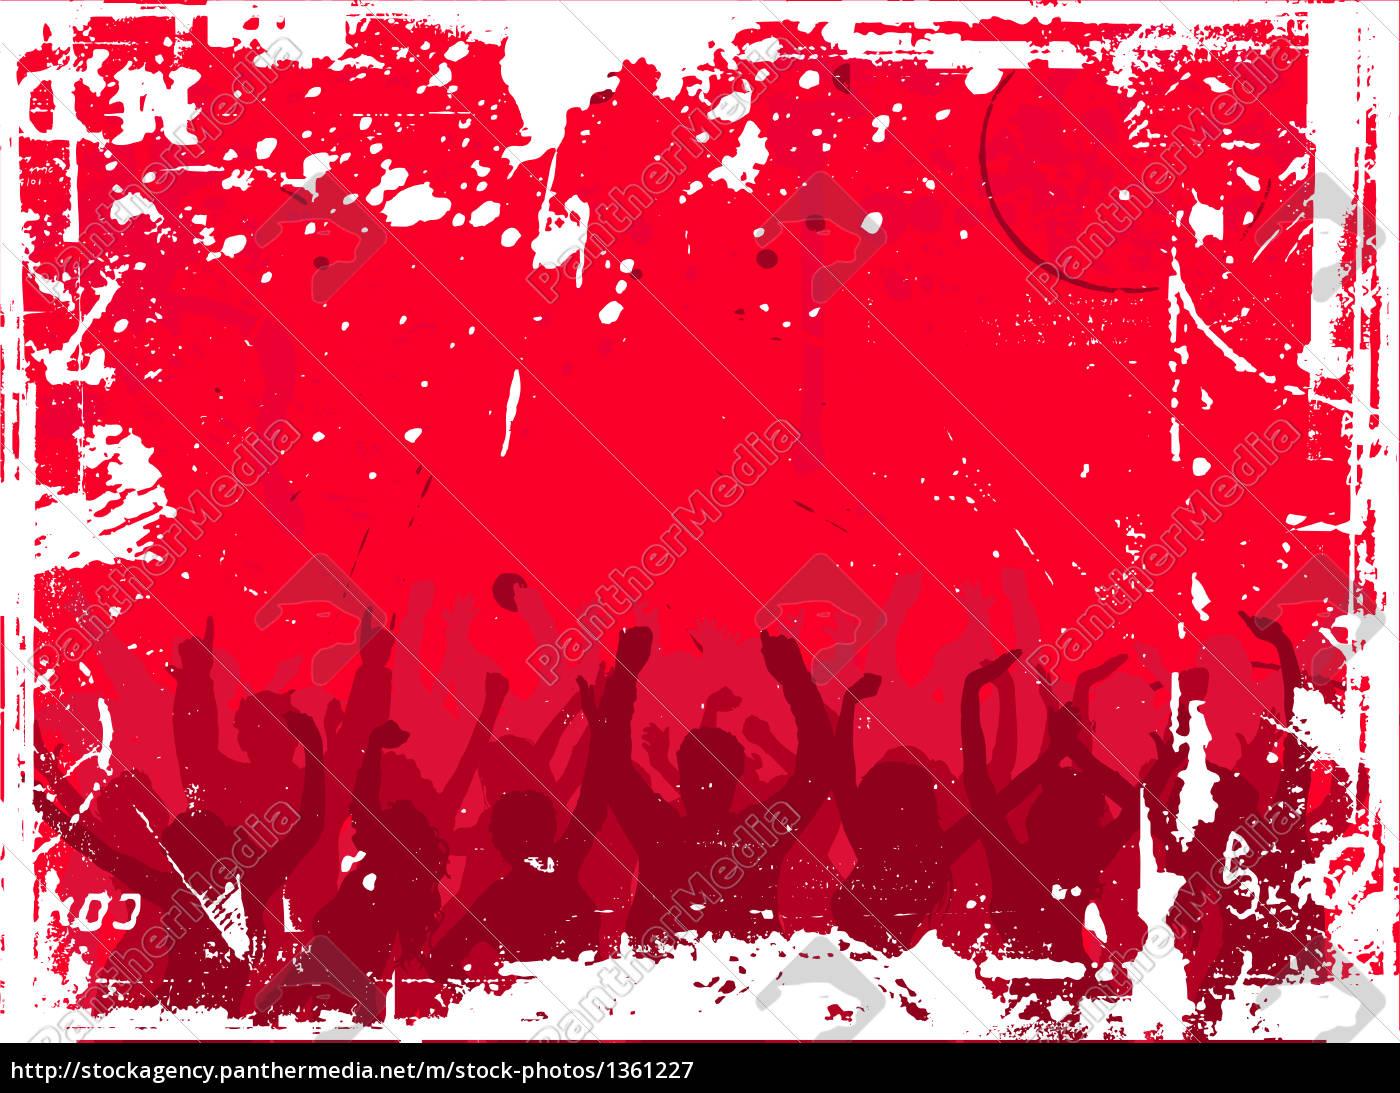 grunge, audience - 1361227